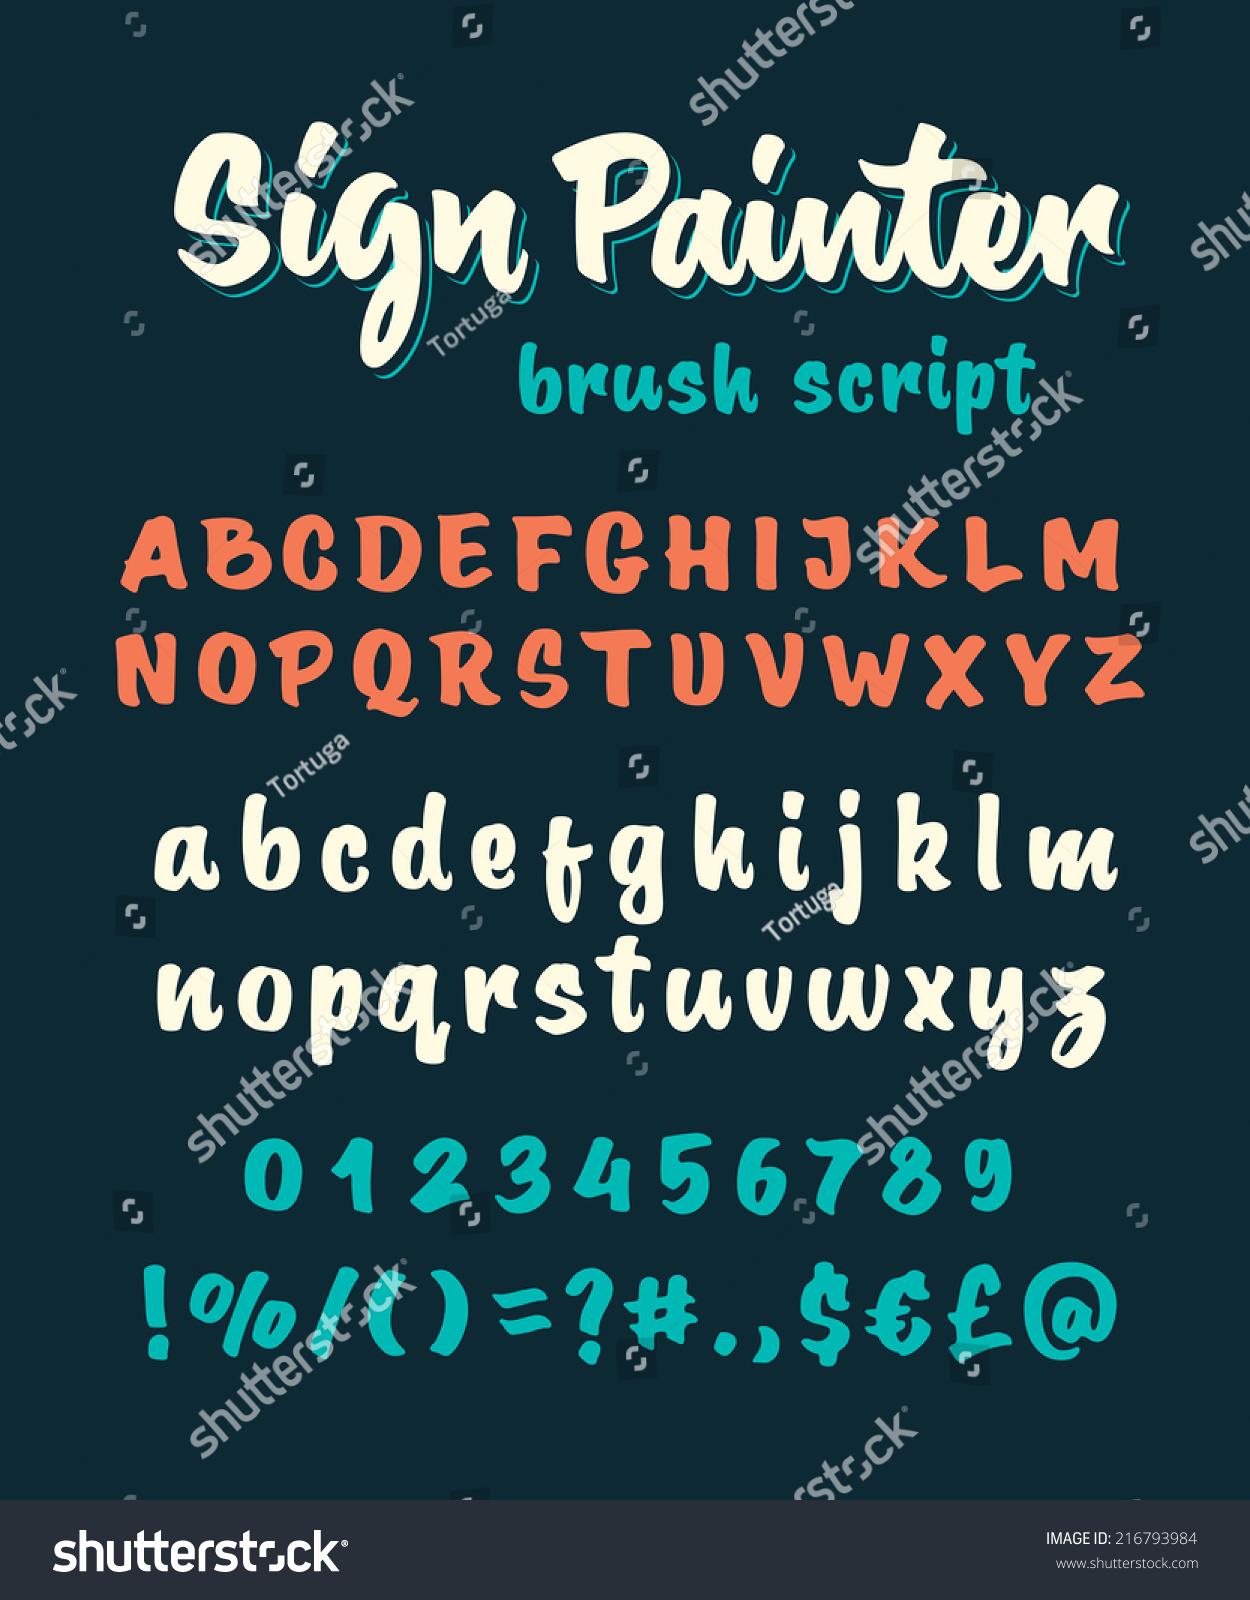 retro vector sign painter brush script lettering font handwritten calligraphic alphabet